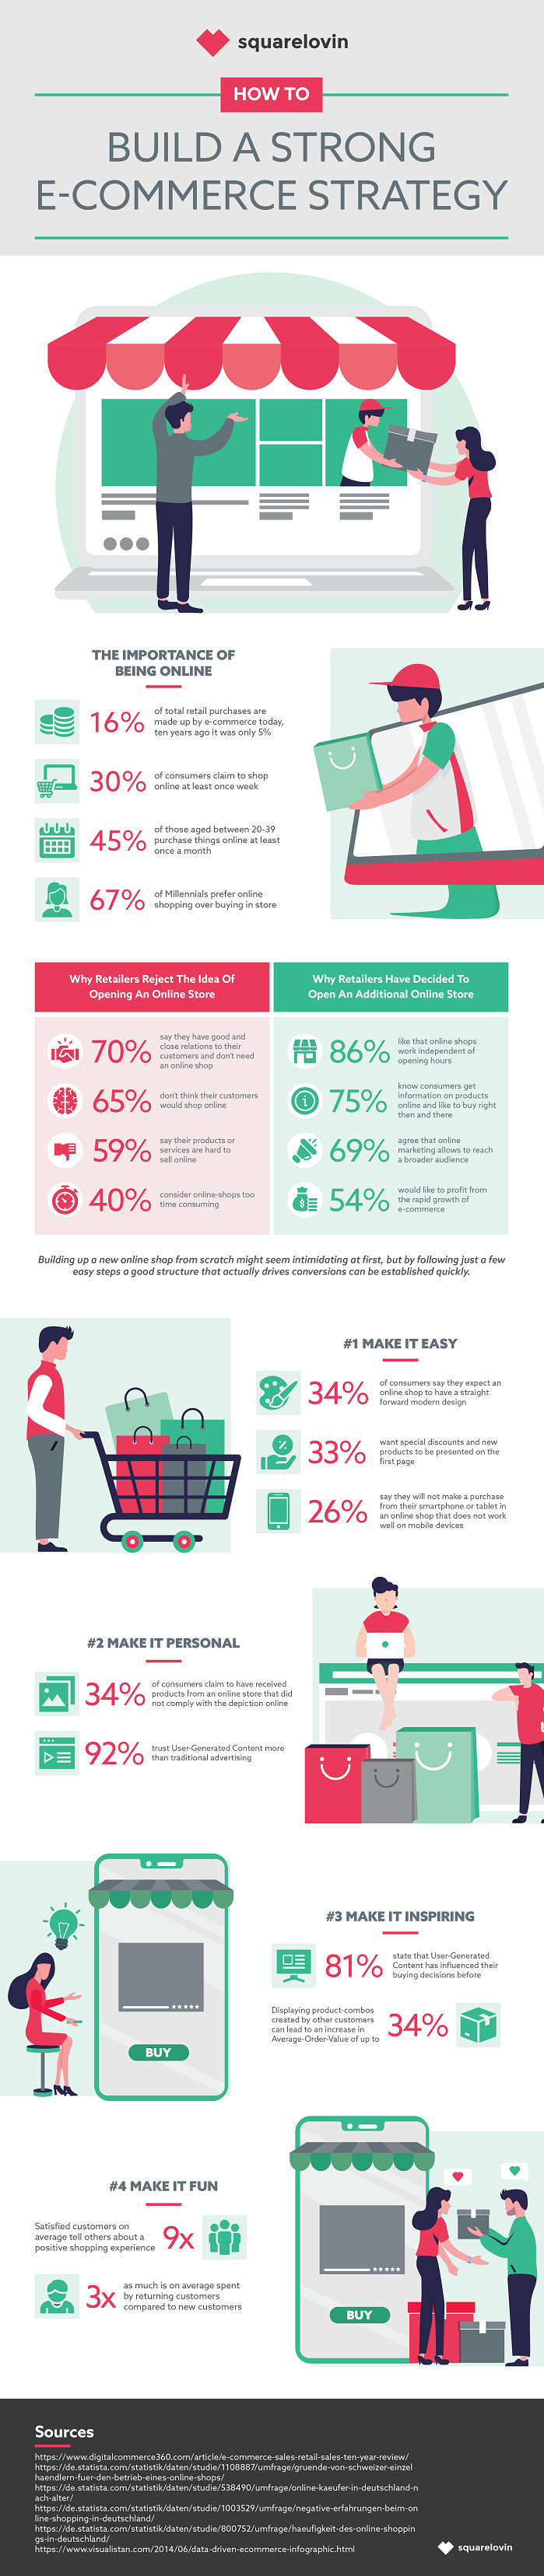 eCommerce insights